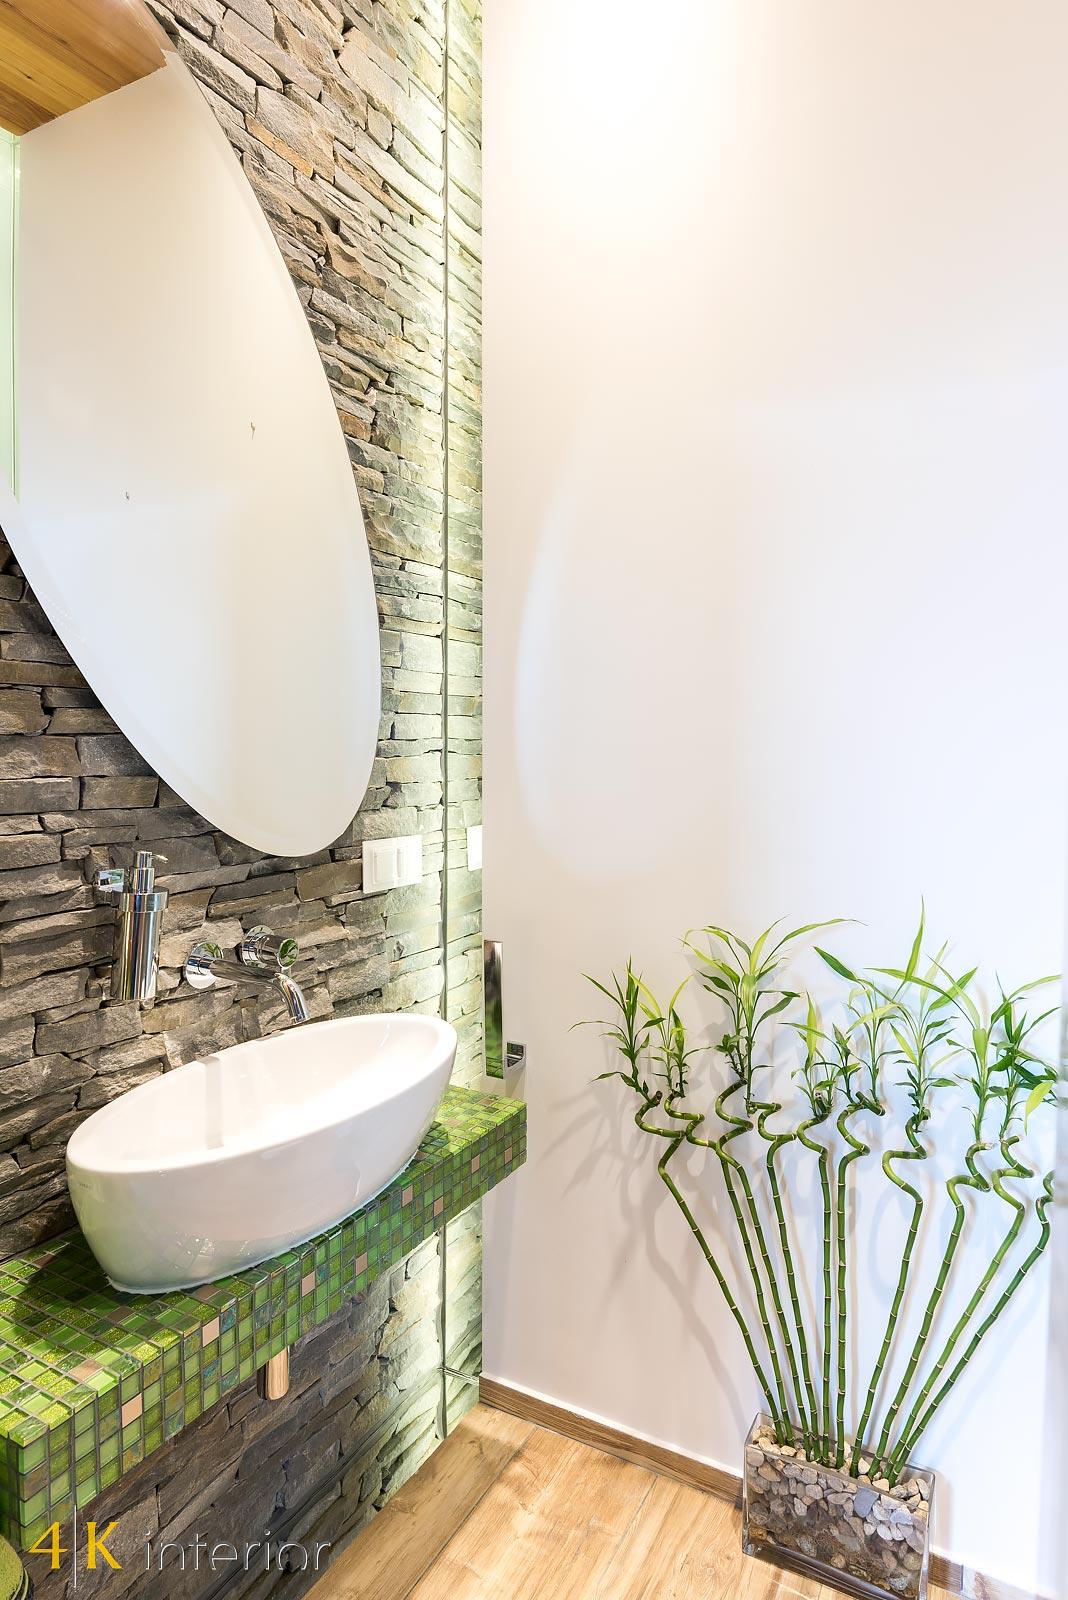 Dom-z-góralskim-charakterem-9 oryginalna toaleta lustro elipsa n